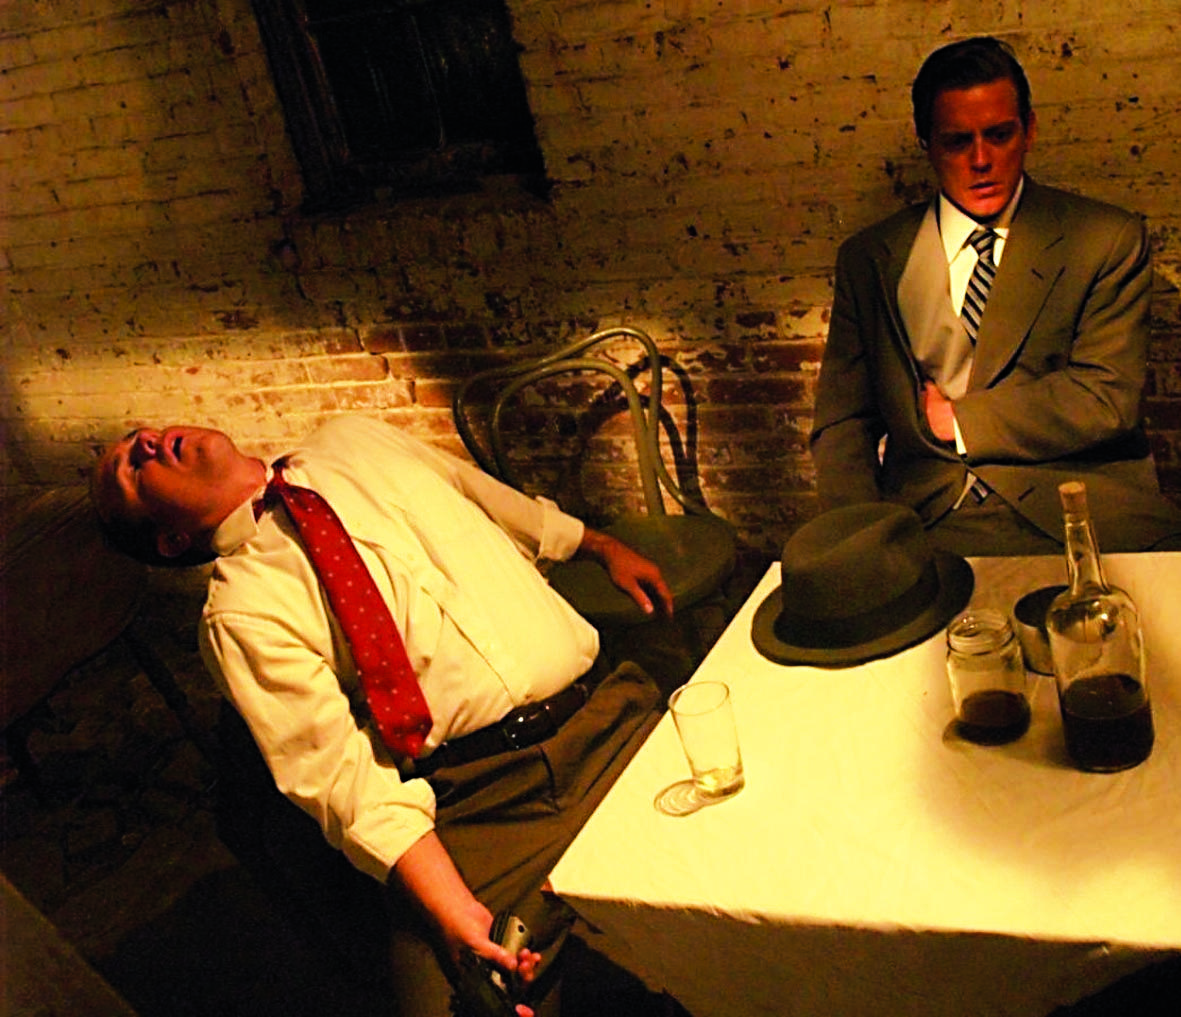 Bonnie & Clyde Vs. Dracula (2020)